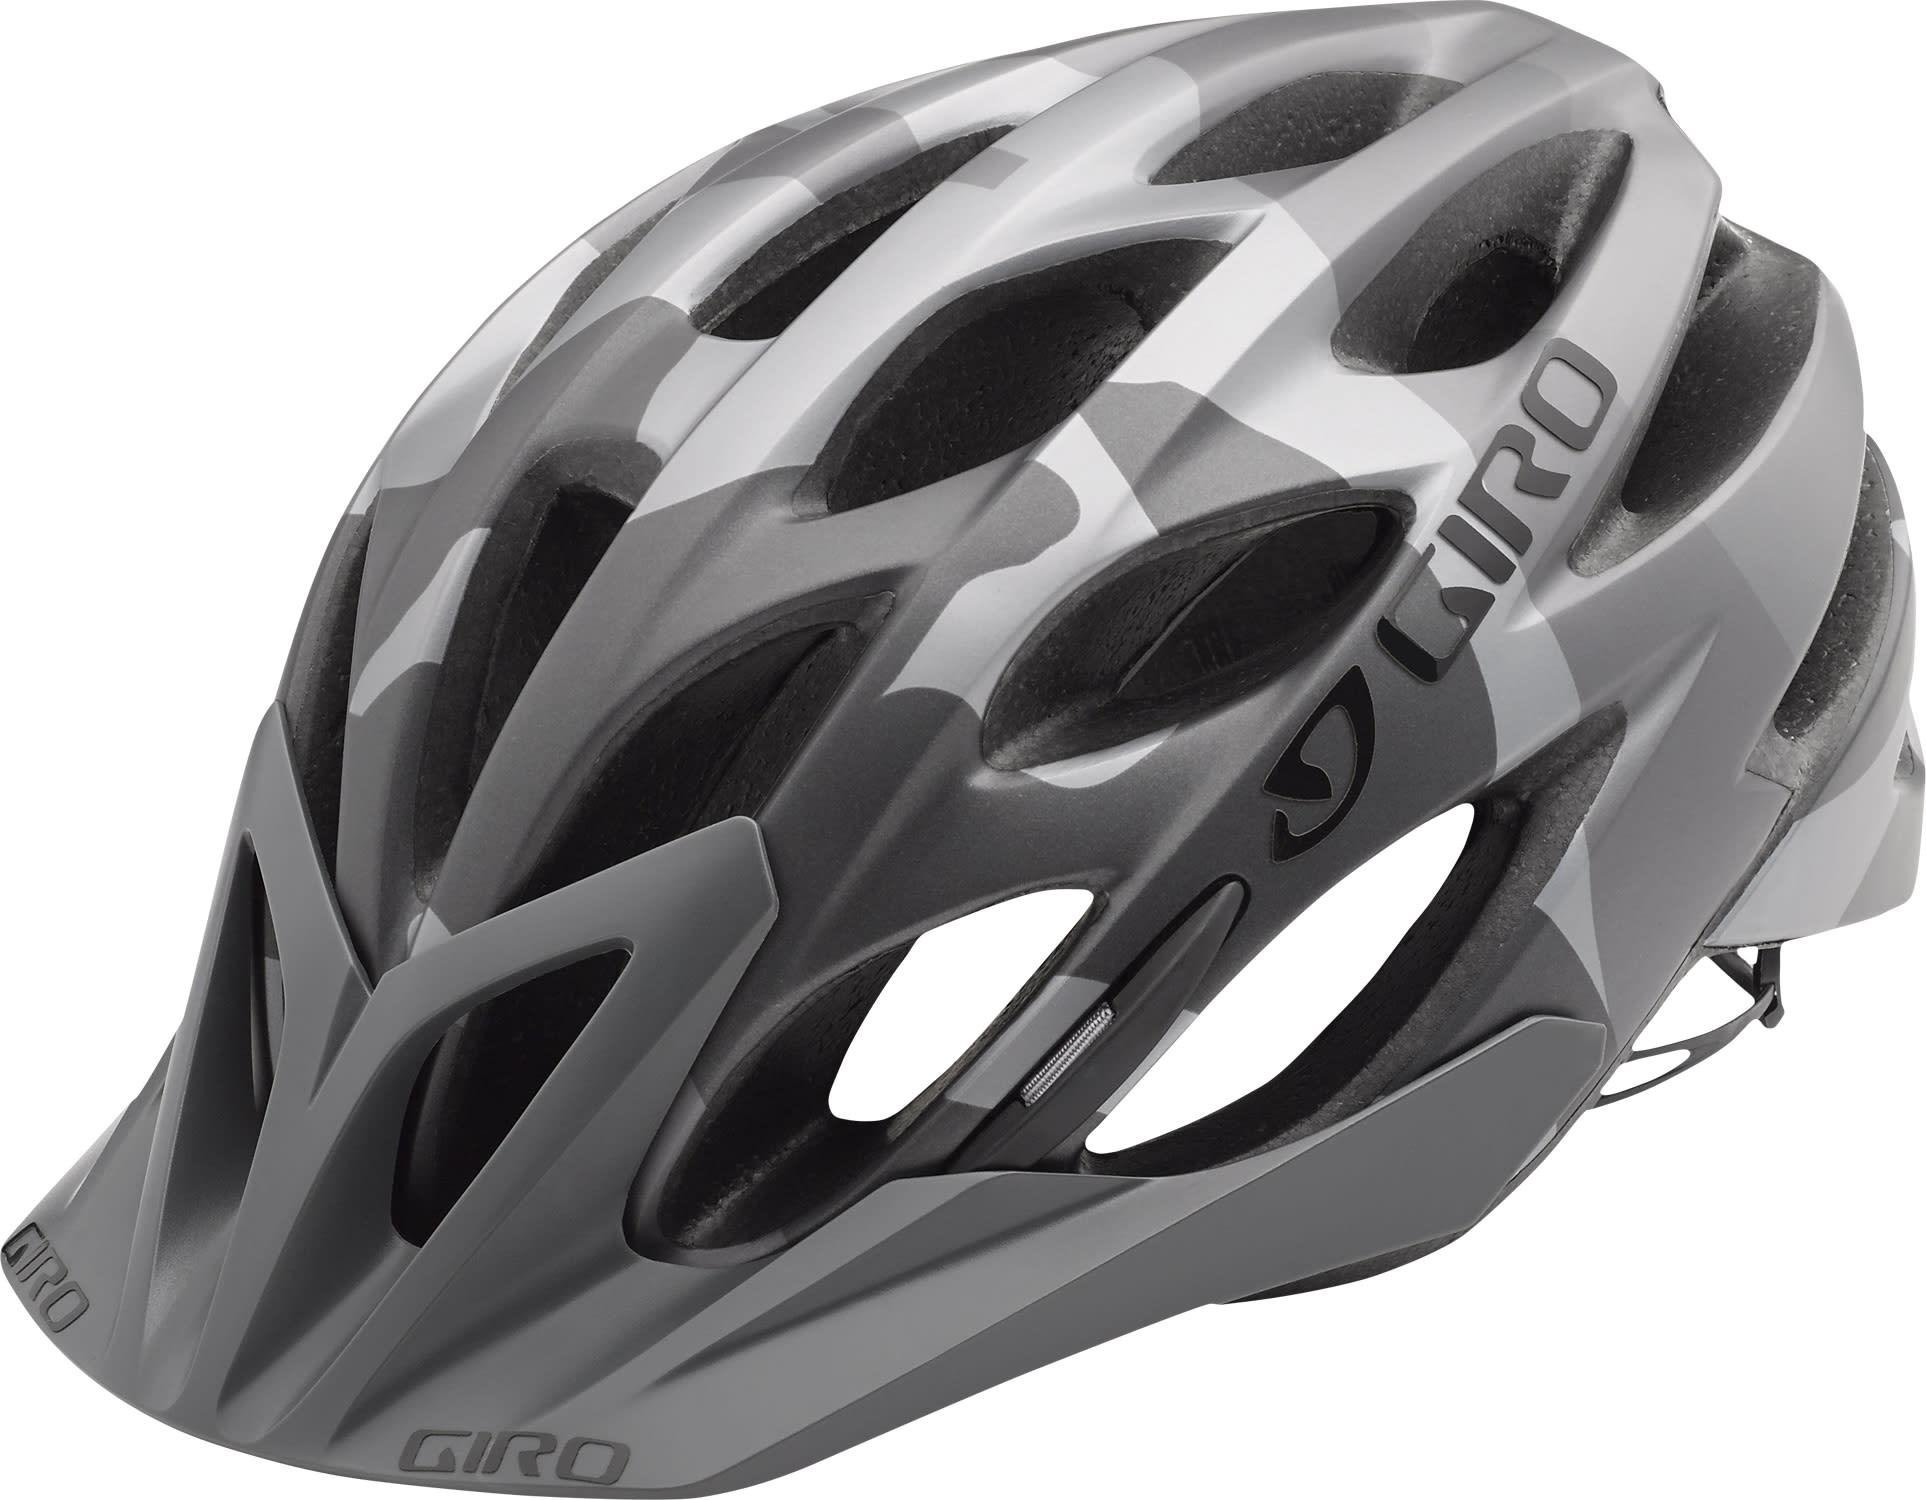 giro phase bike helmet. Black Bedroom Furniture Sets. Home Design Ideas